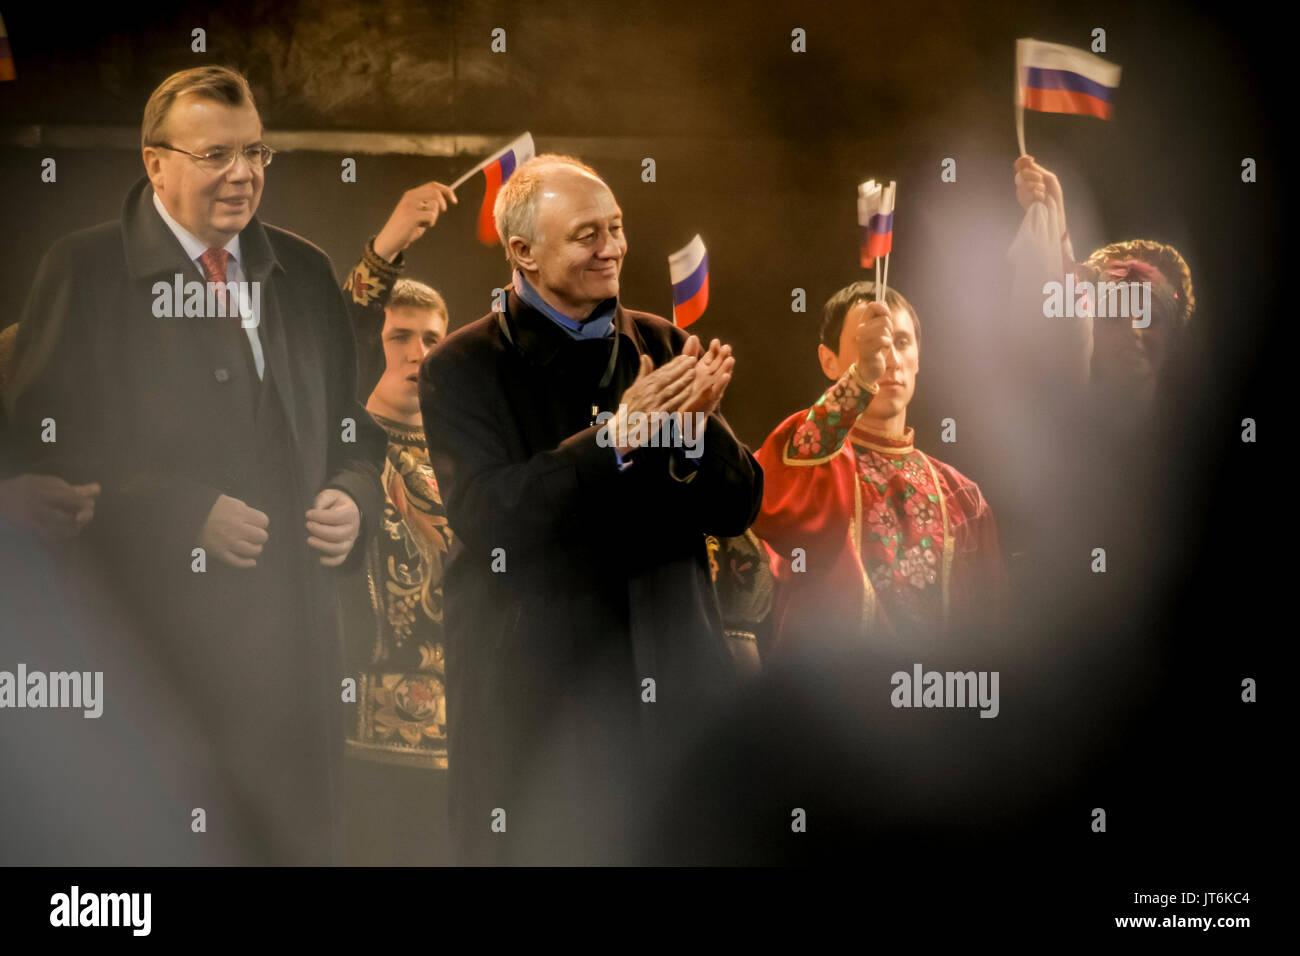 Ken Livingstone MP (C) and Yury Fedotov (L) the Russian Ambassador to Great Britain, attend the 4th Annual Russian Winter Festival in Trafalgar Square, London, UK. - Stock Image